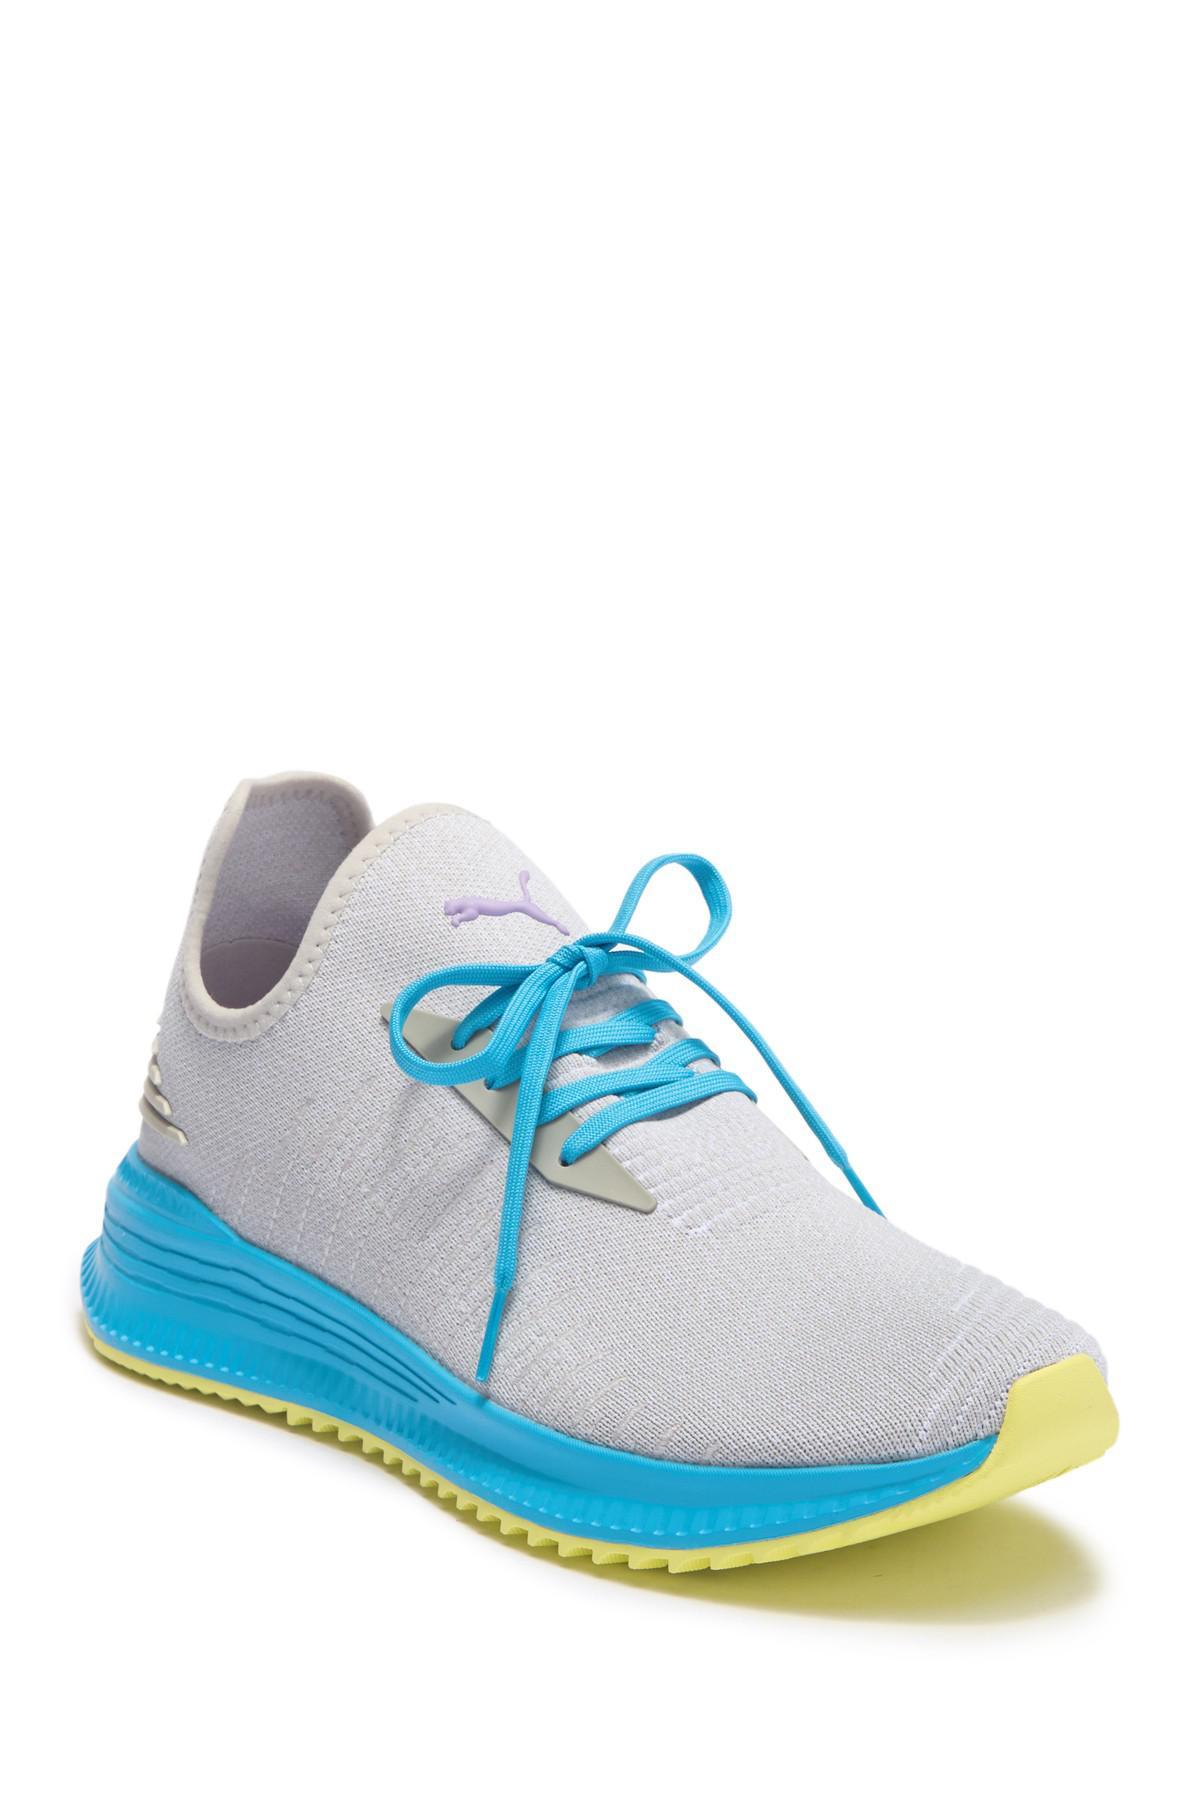 ce48a805e44 Lyst - PUMA Avid Evoknit Msp Sneaker in Gray for Men